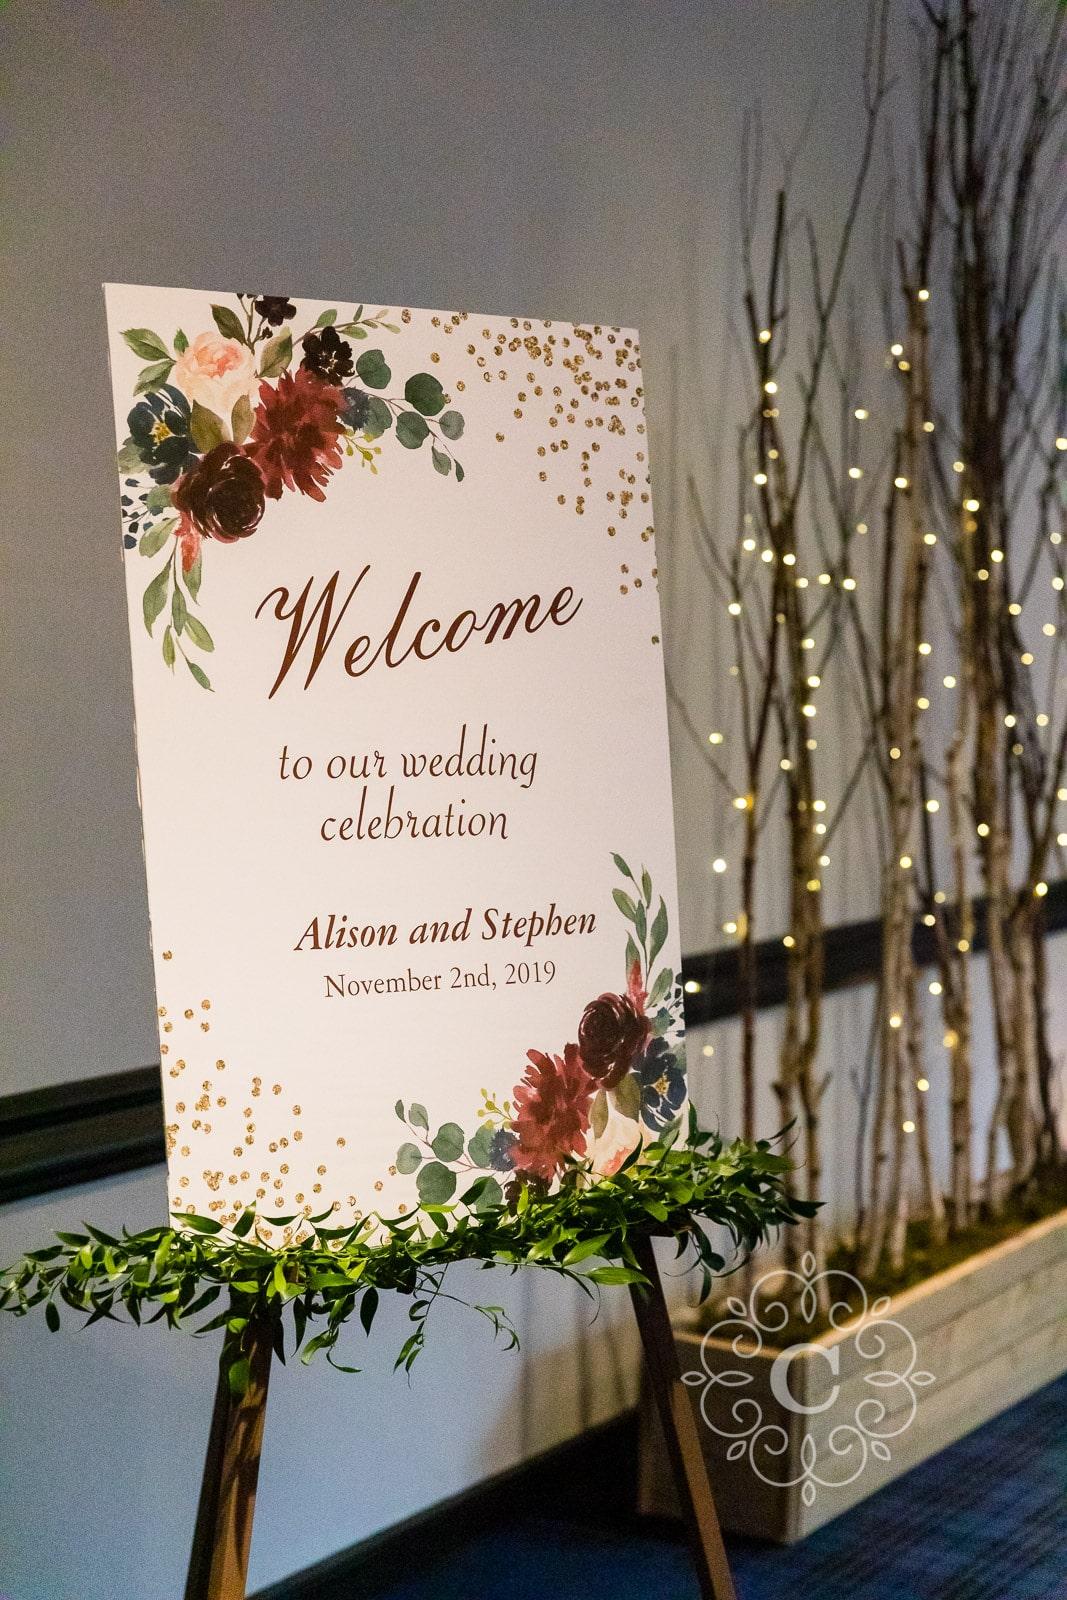 Graduate Hotel Minneapolis MN Wedding Photo